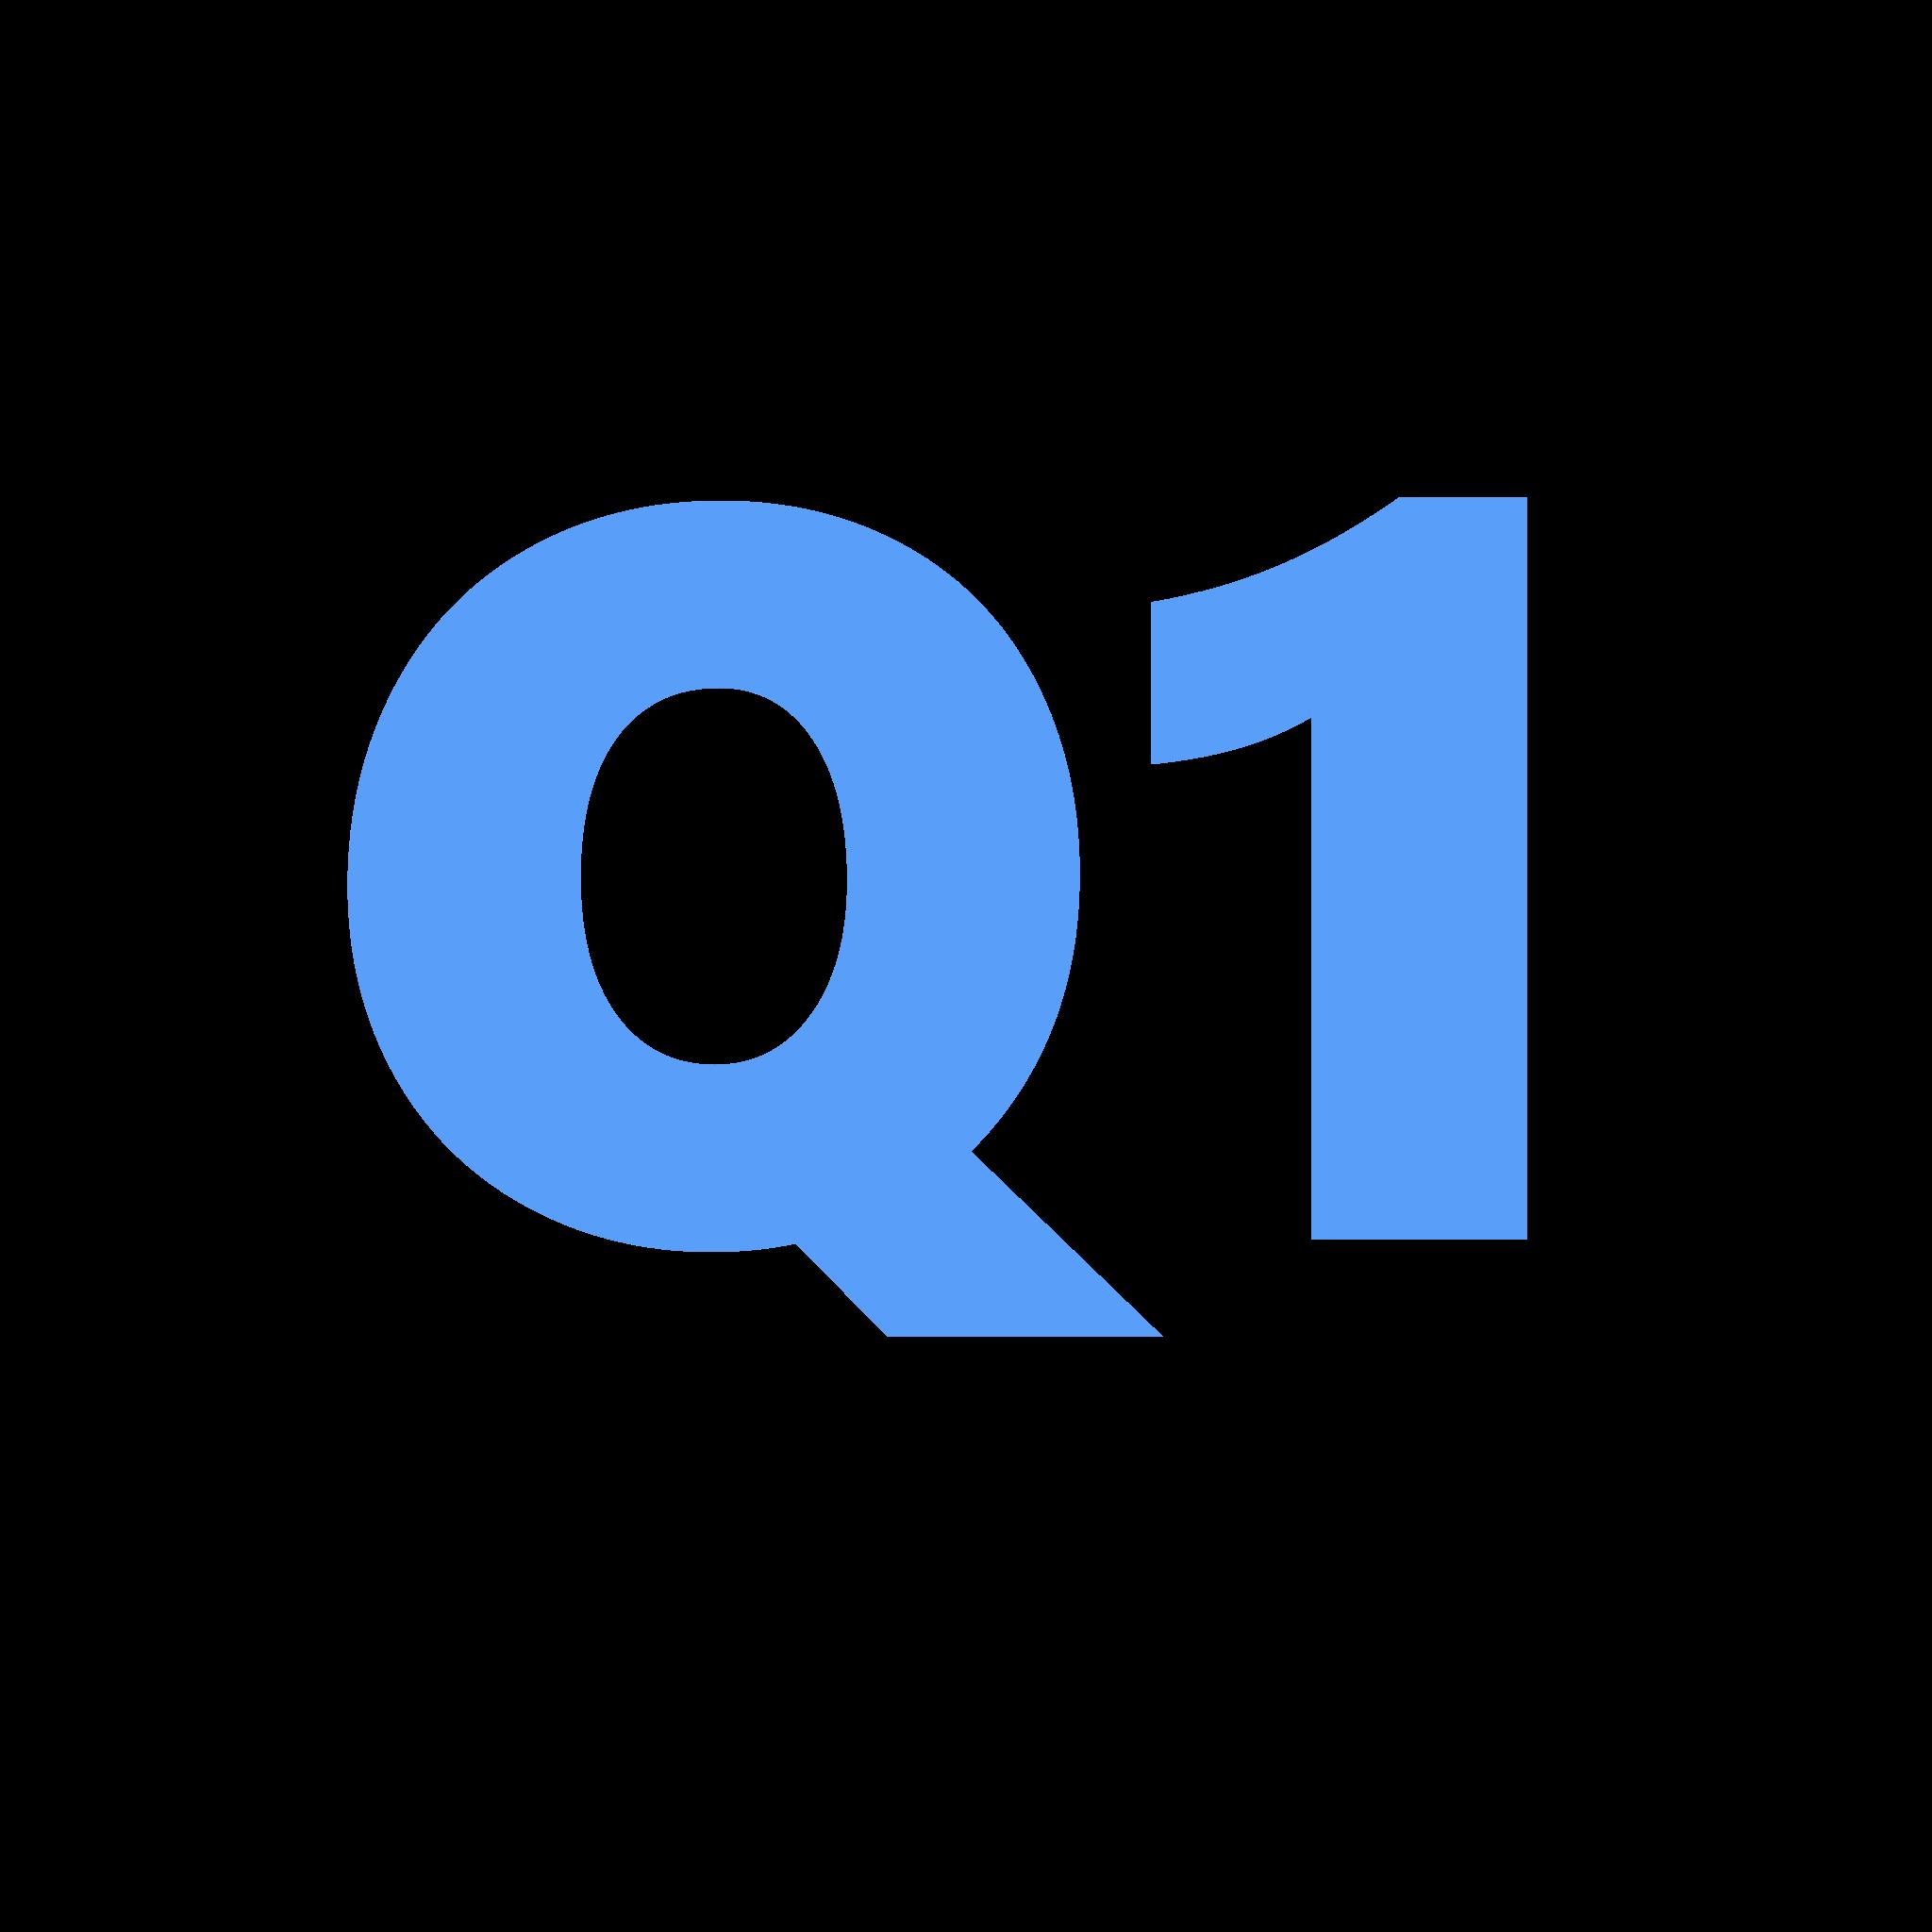 The current quarter is Q1 2019